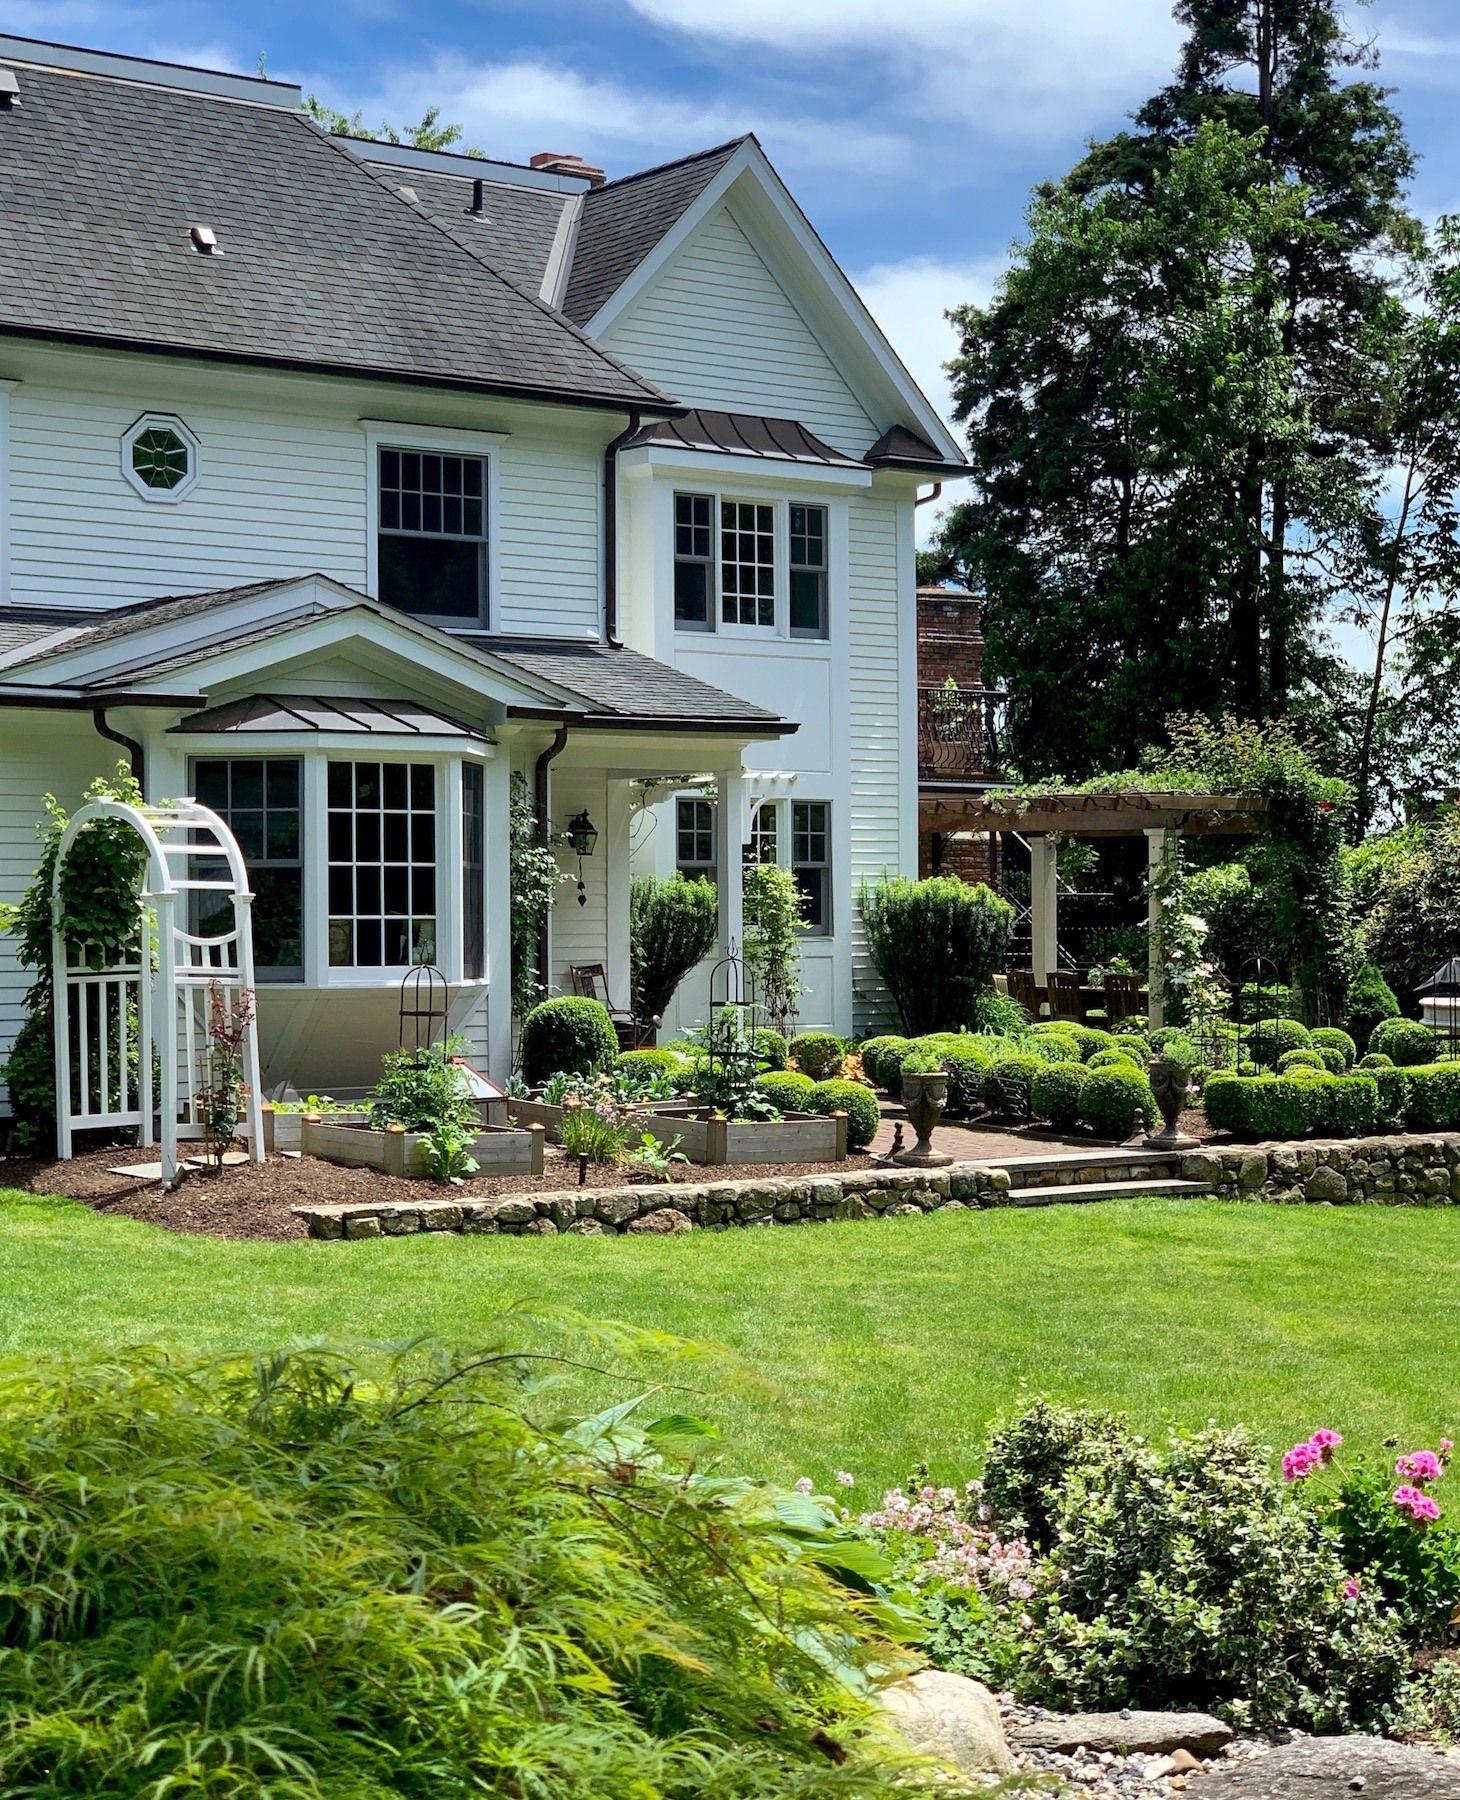 Enchanting Garden Tour in Greenwich Connecticut